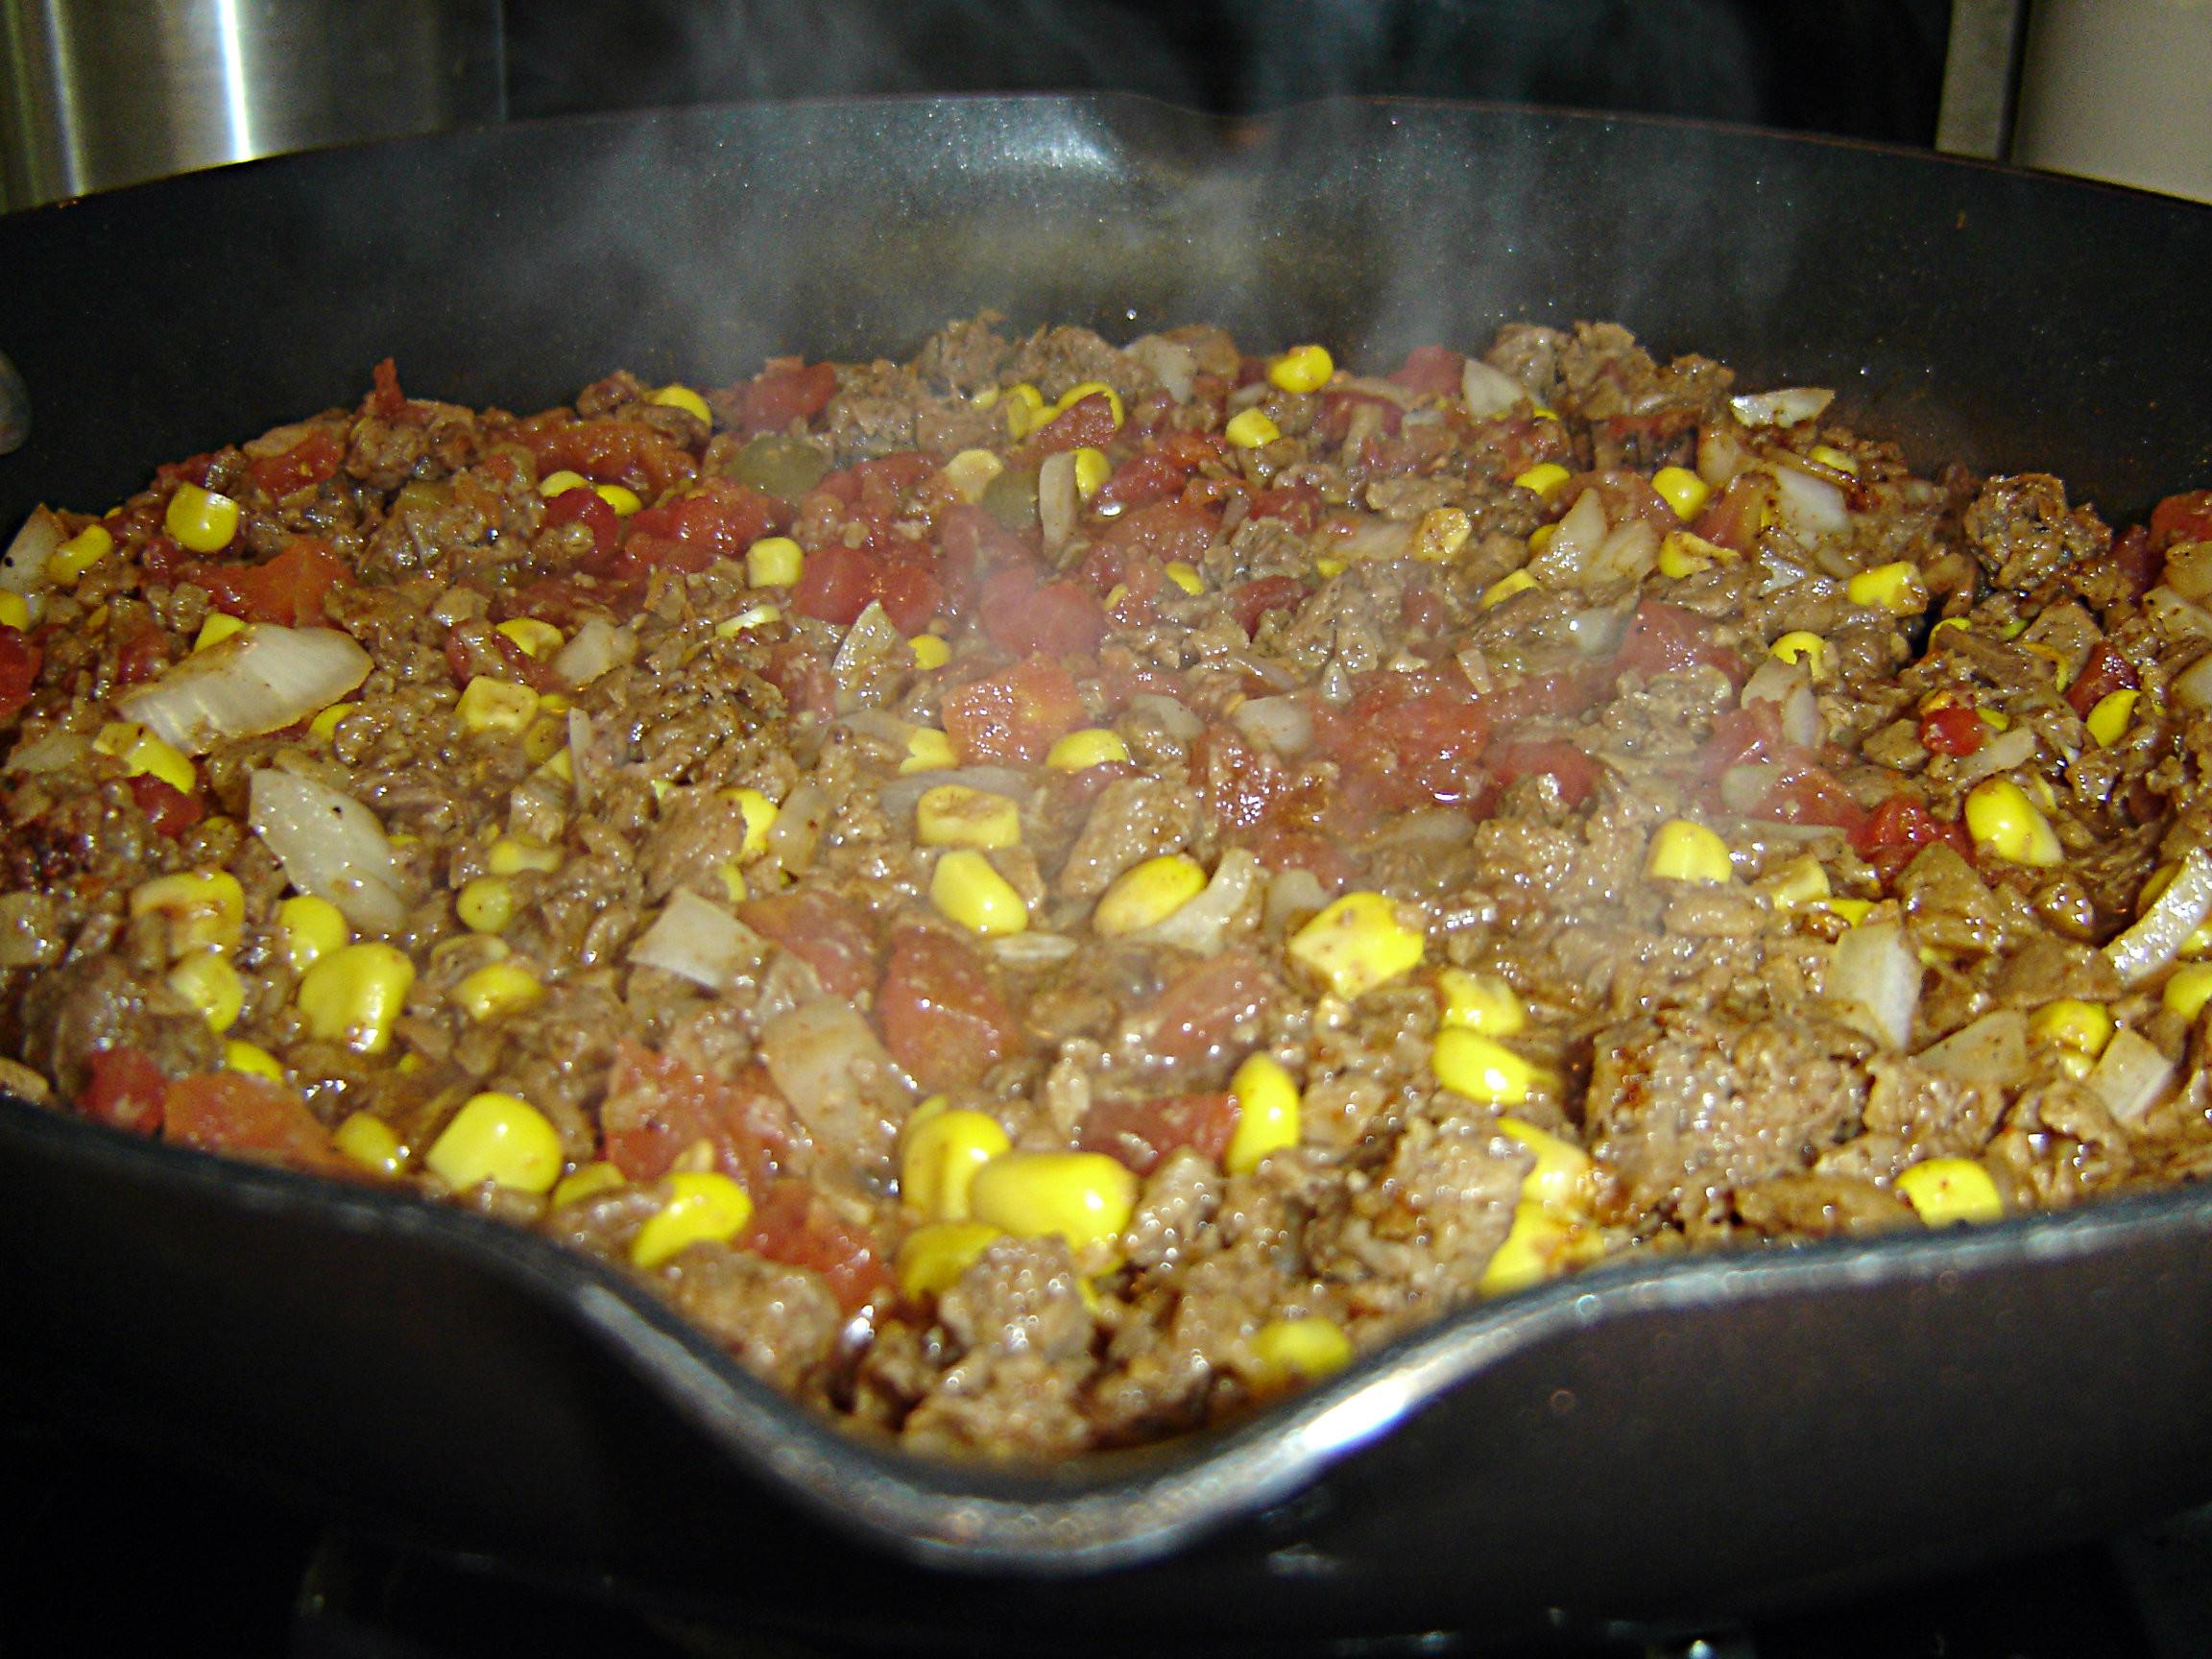 Crock Pot Recipes With Ground Beef  crockpot ground beef recipes